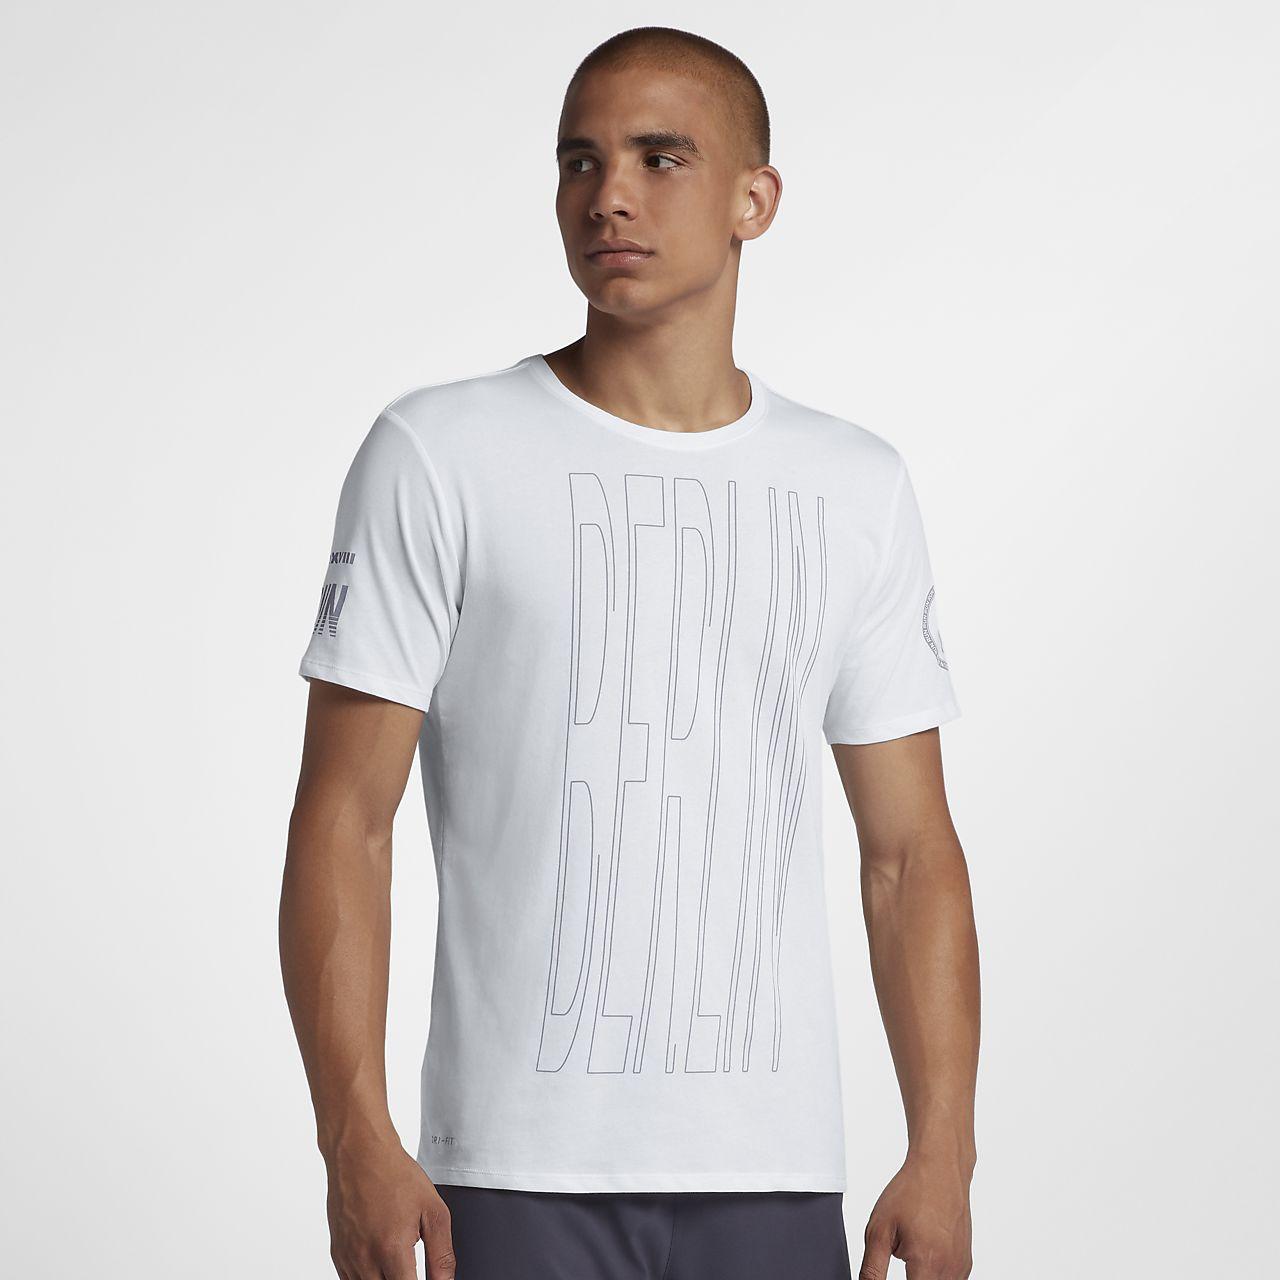 5ffa26e02f9b16 Nike Dri-FIT (Berlin 2018) Men s Running T-Shirt. Nike.com AU